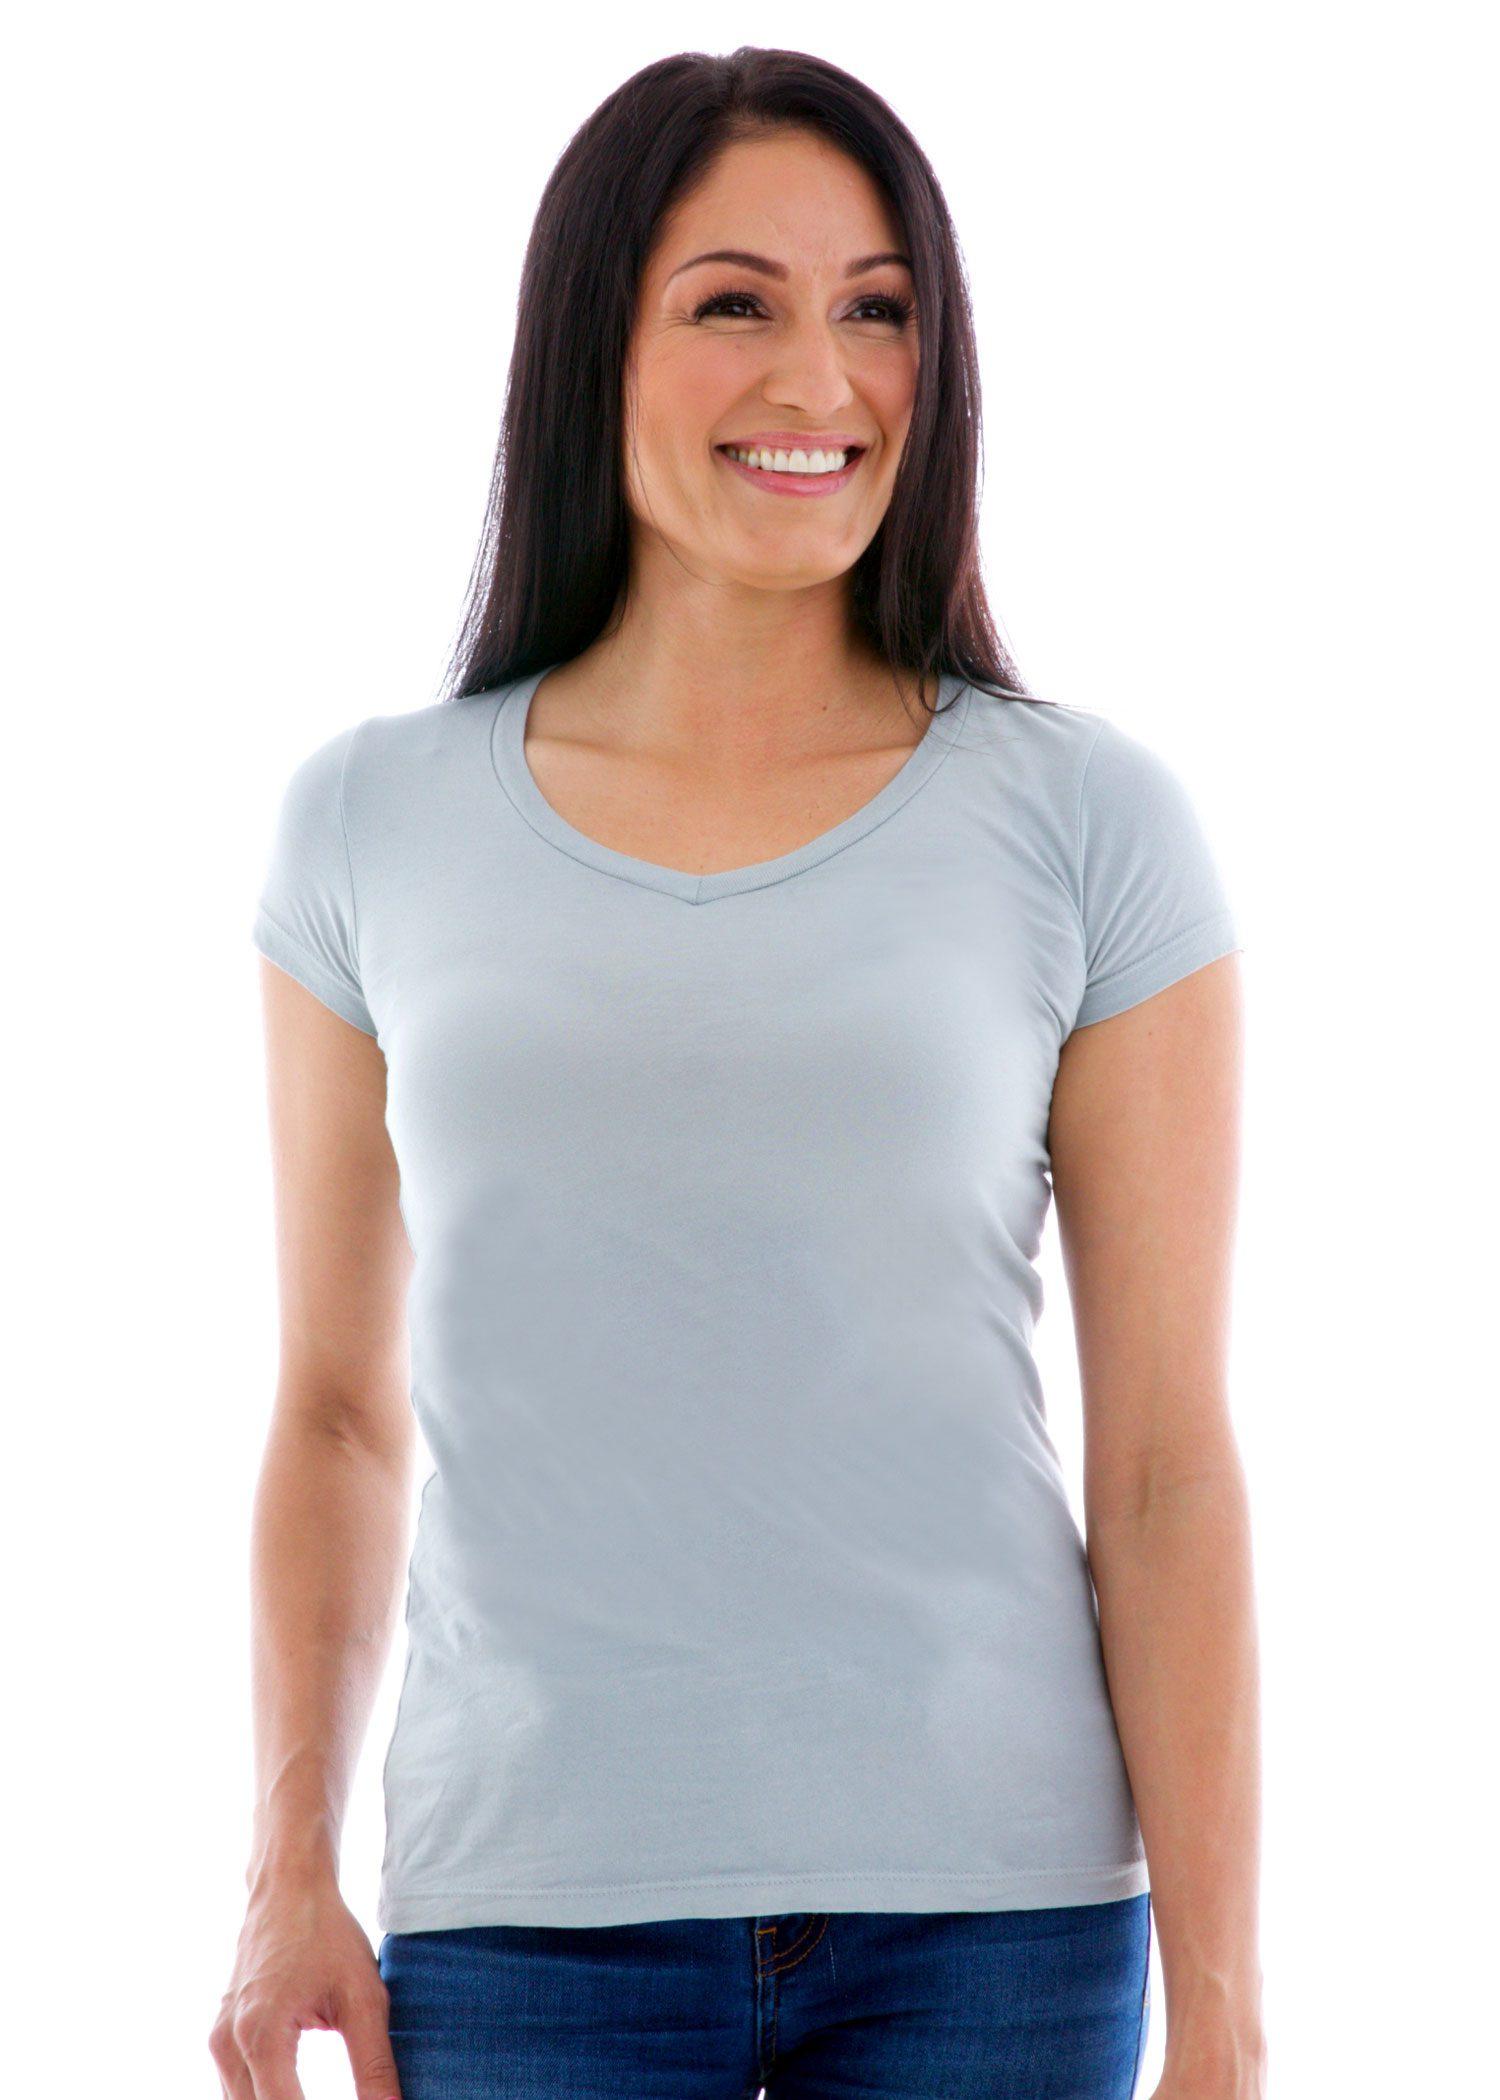 Premium Shallow V-neck Short Sleeve T-Shirt Front View